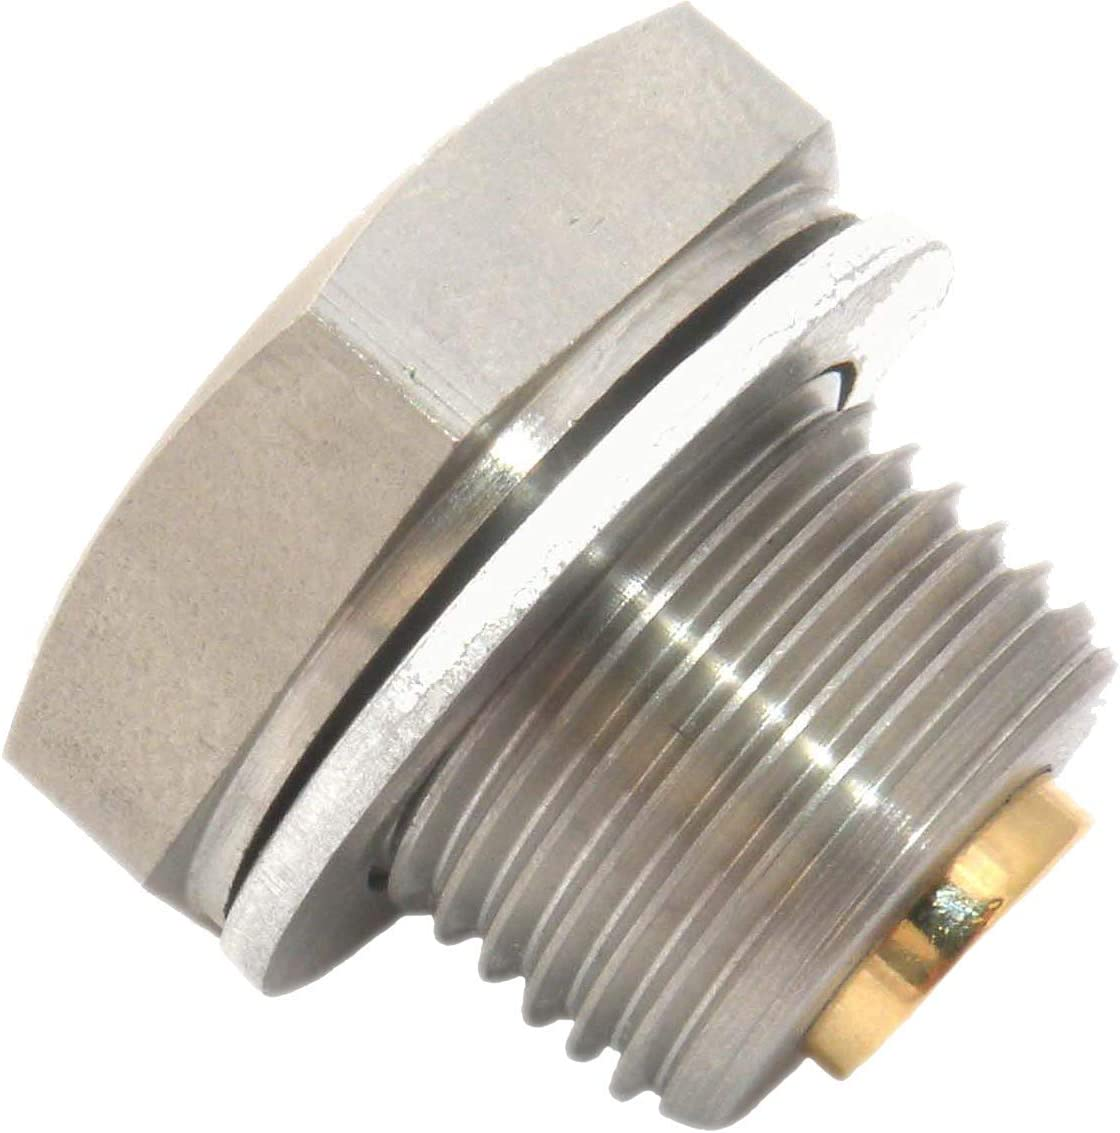 M18 x 1.5 Gold Plug AP-05S Magnetic Sump Plug